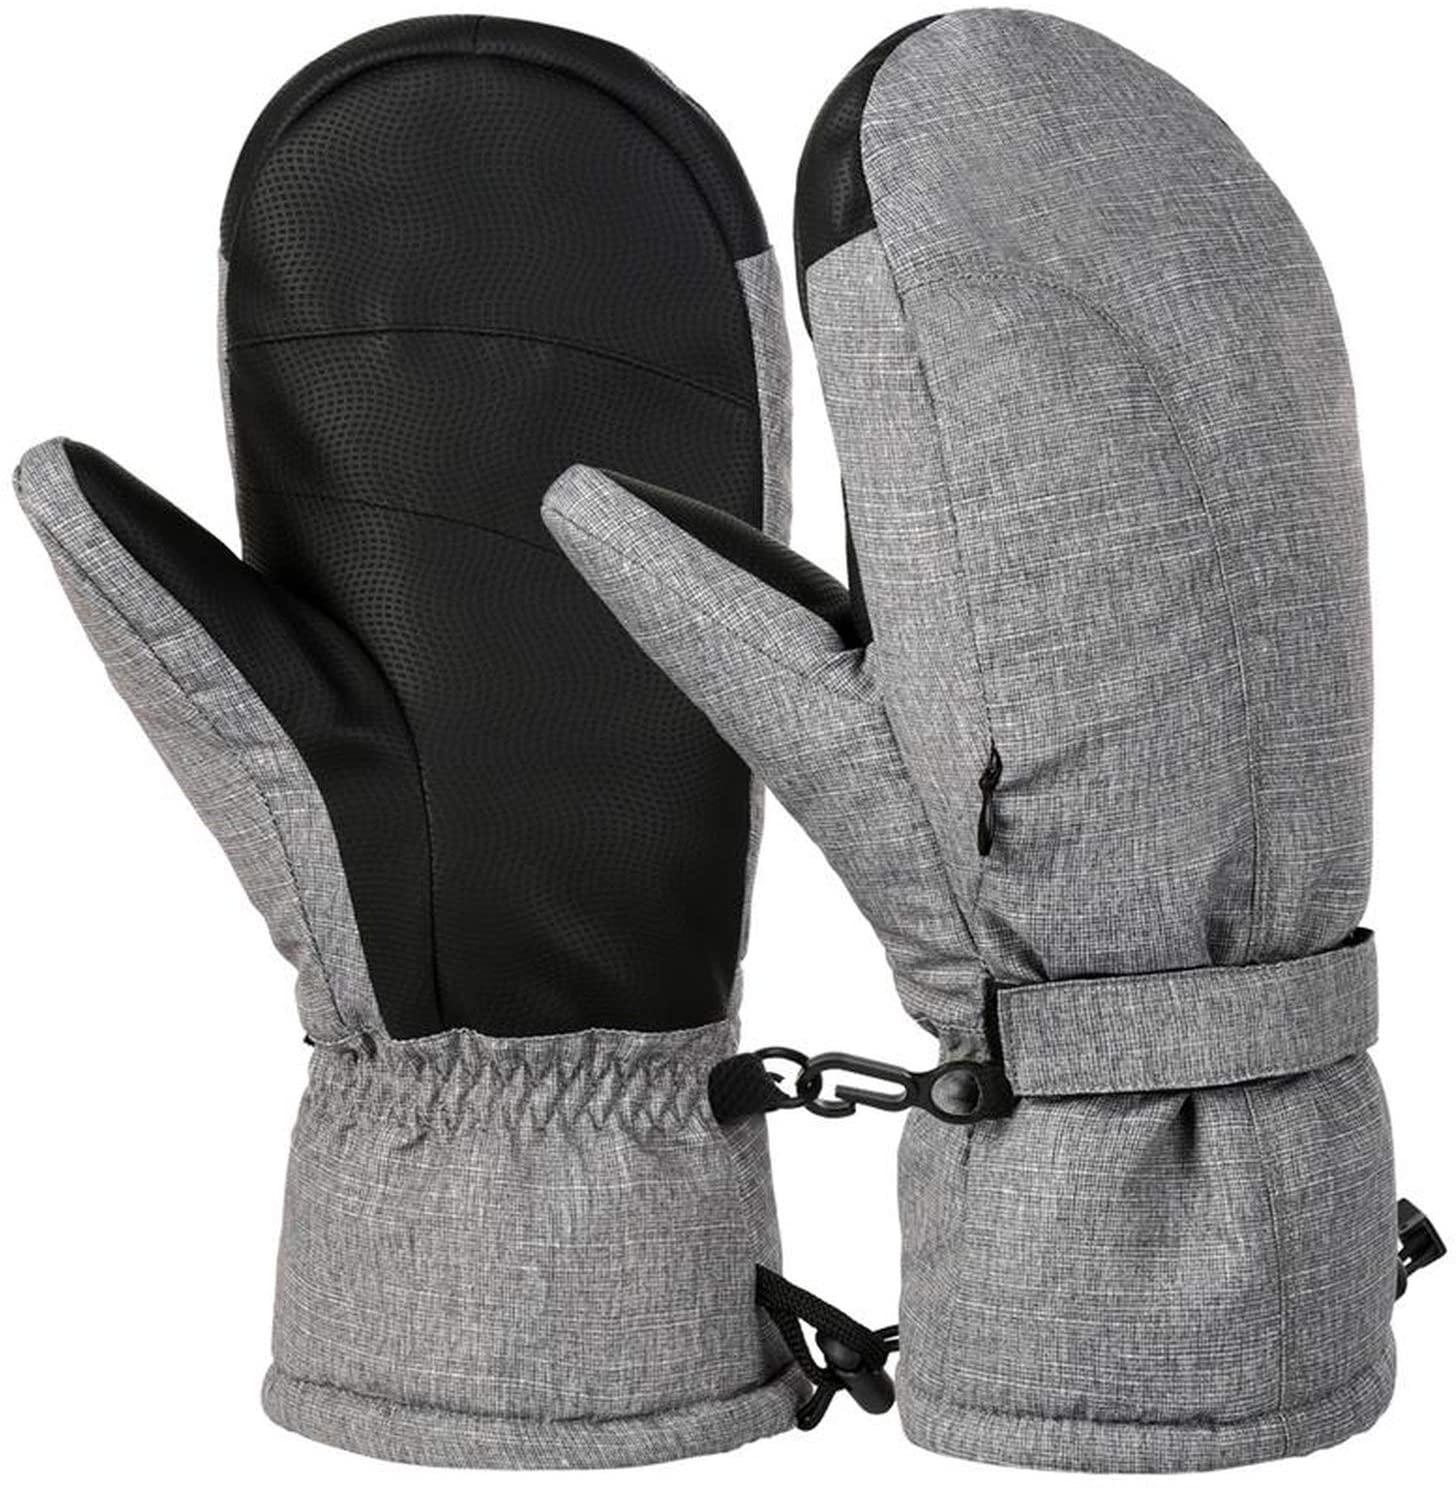 YR5V4V Men Women Warm Winter Ski Gloves Outdoor Sports Mitten Thickened Cold Weather Gloves Windproof Winter Snowboard Gloves-in Skiing Gloves